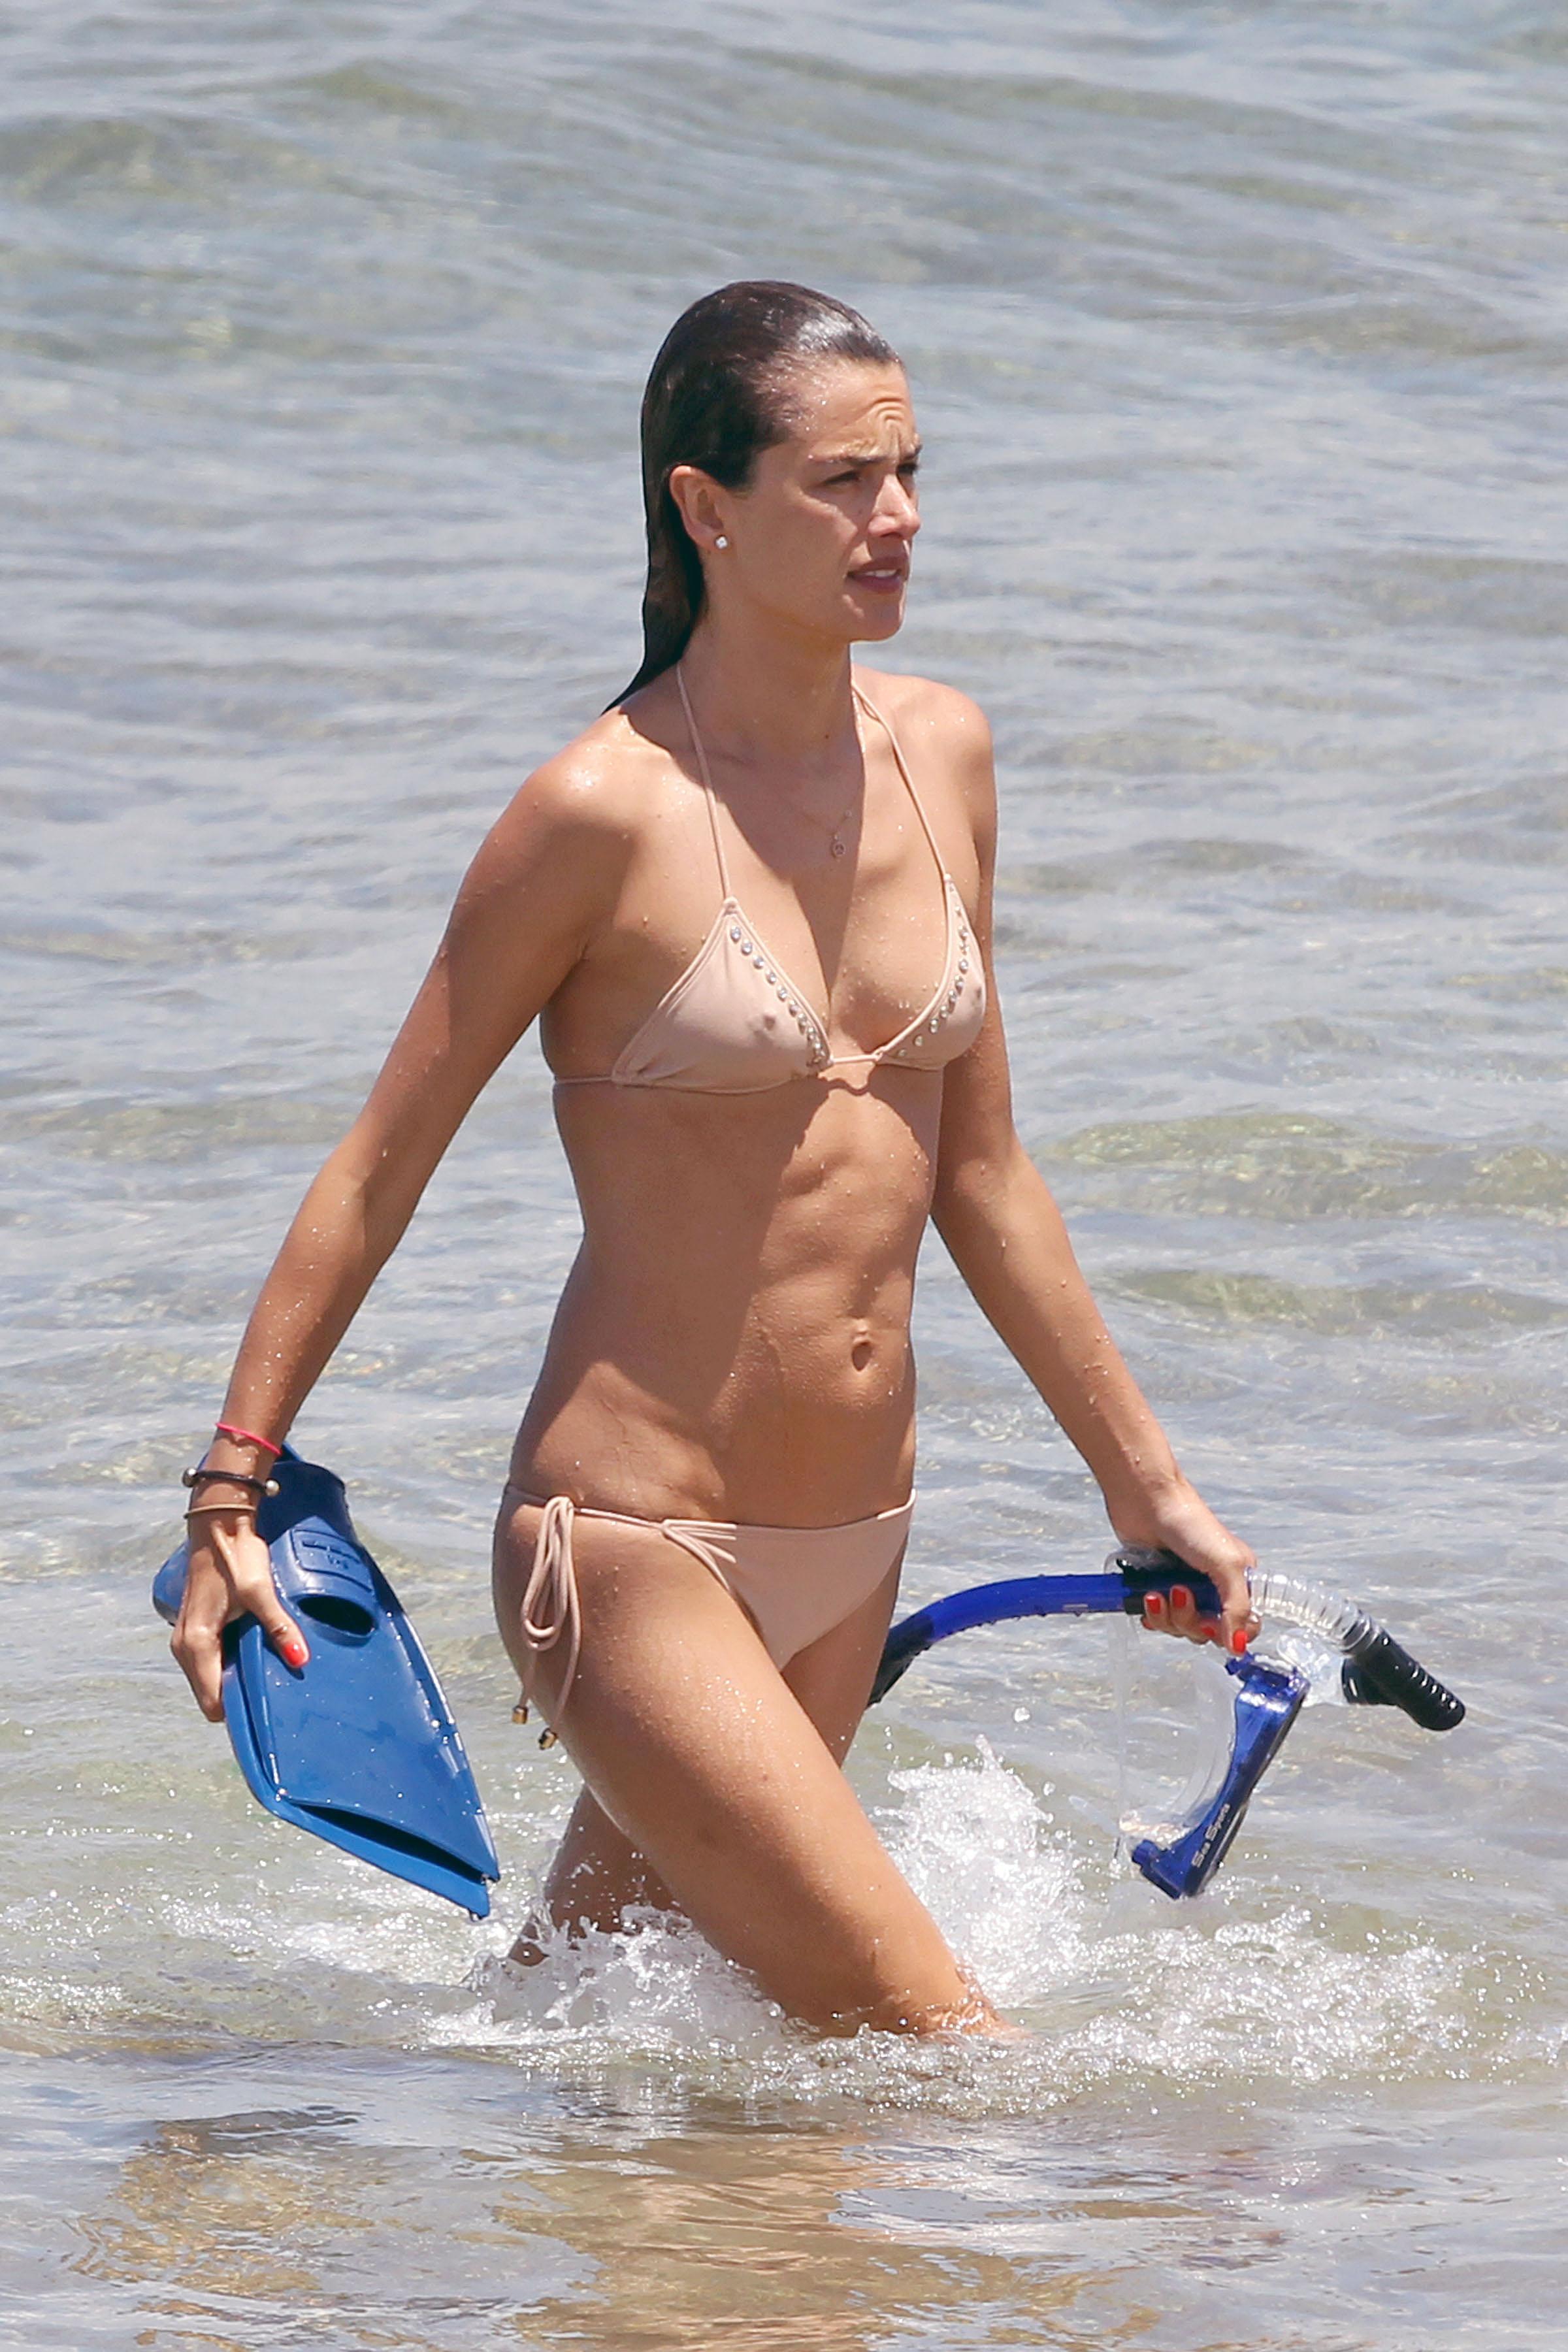 79796_Alessandra_Ambrosio_on_the_beach_in_Hawaii_6_122_484lo.jpg